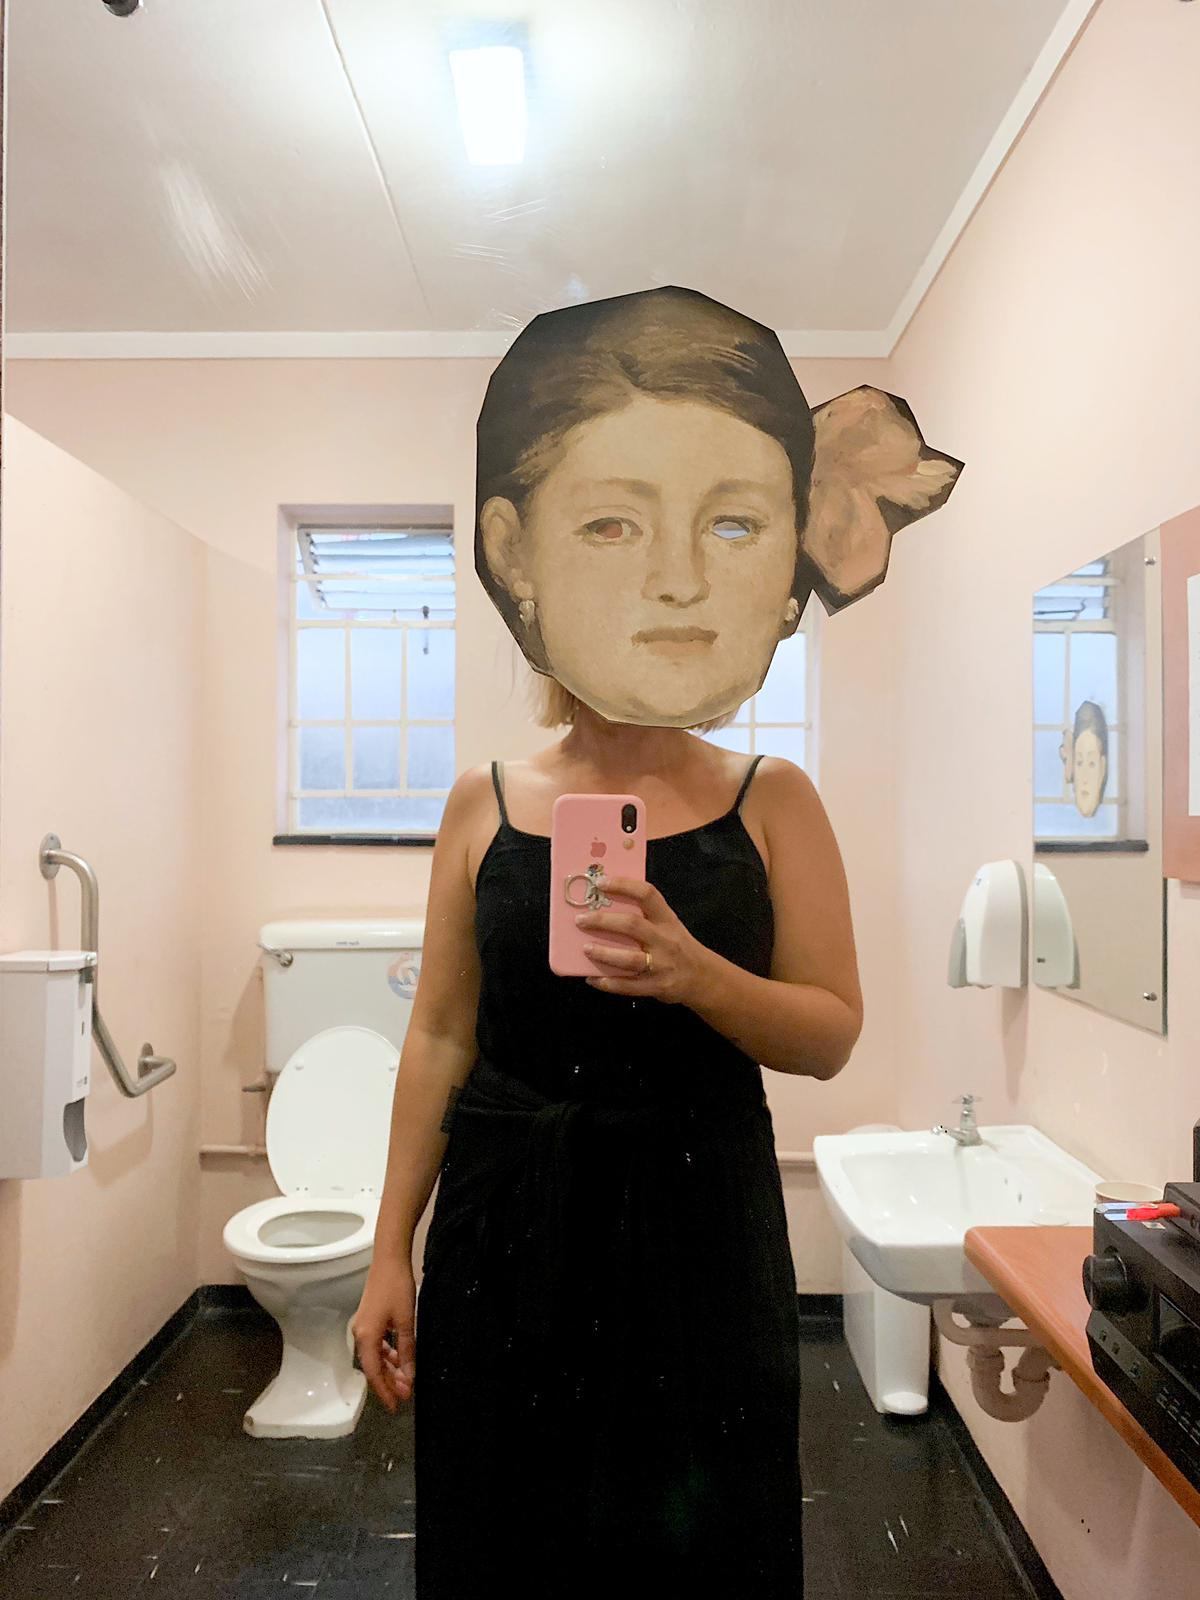 La Toilette, 2019